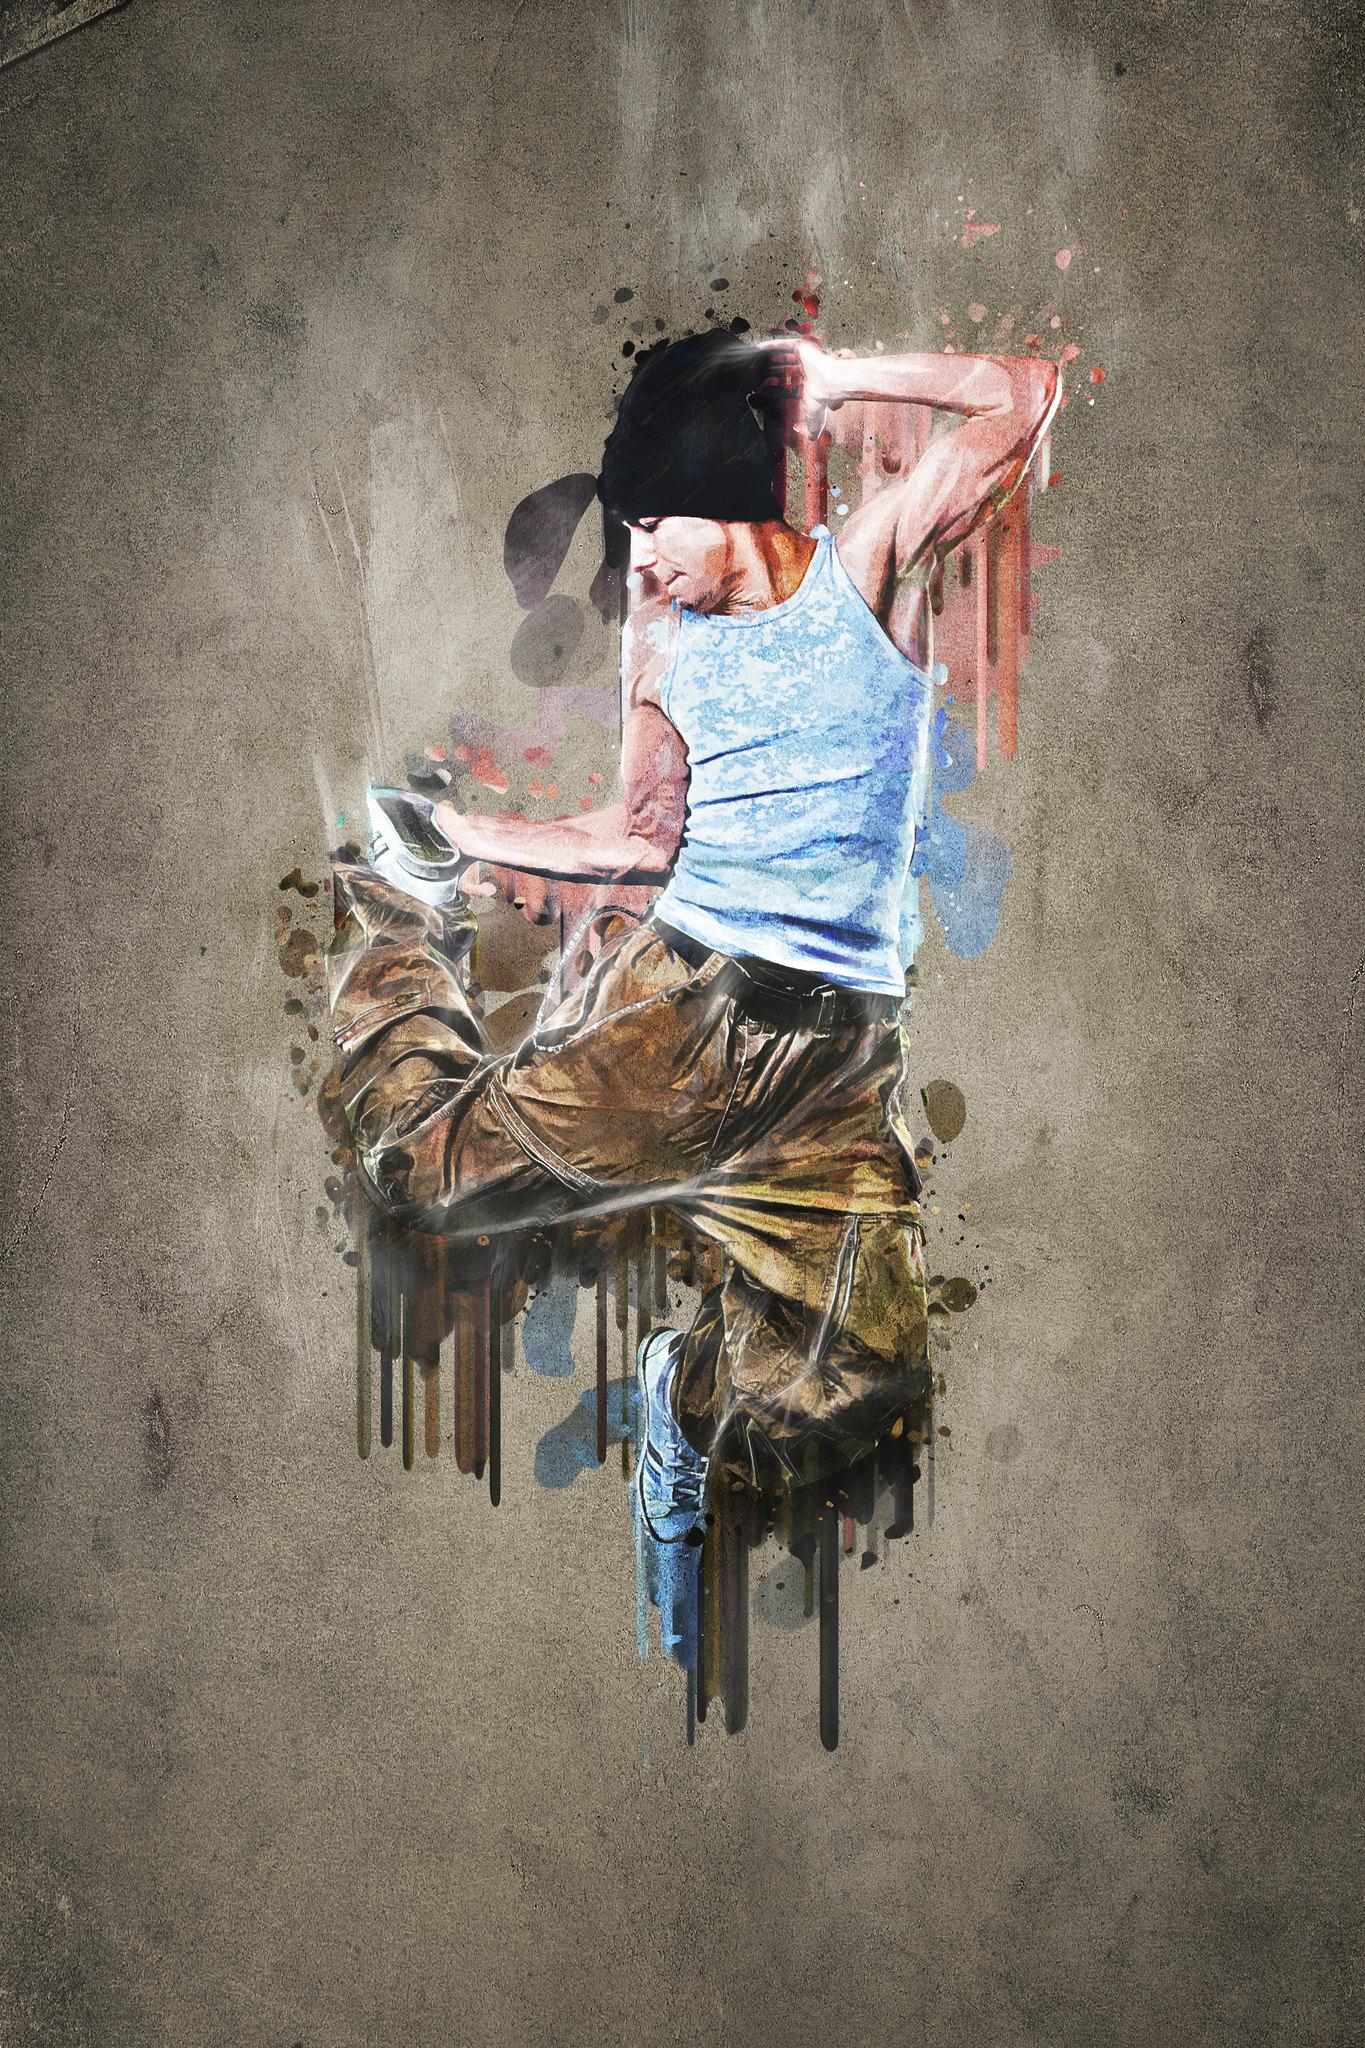 painted break dancer